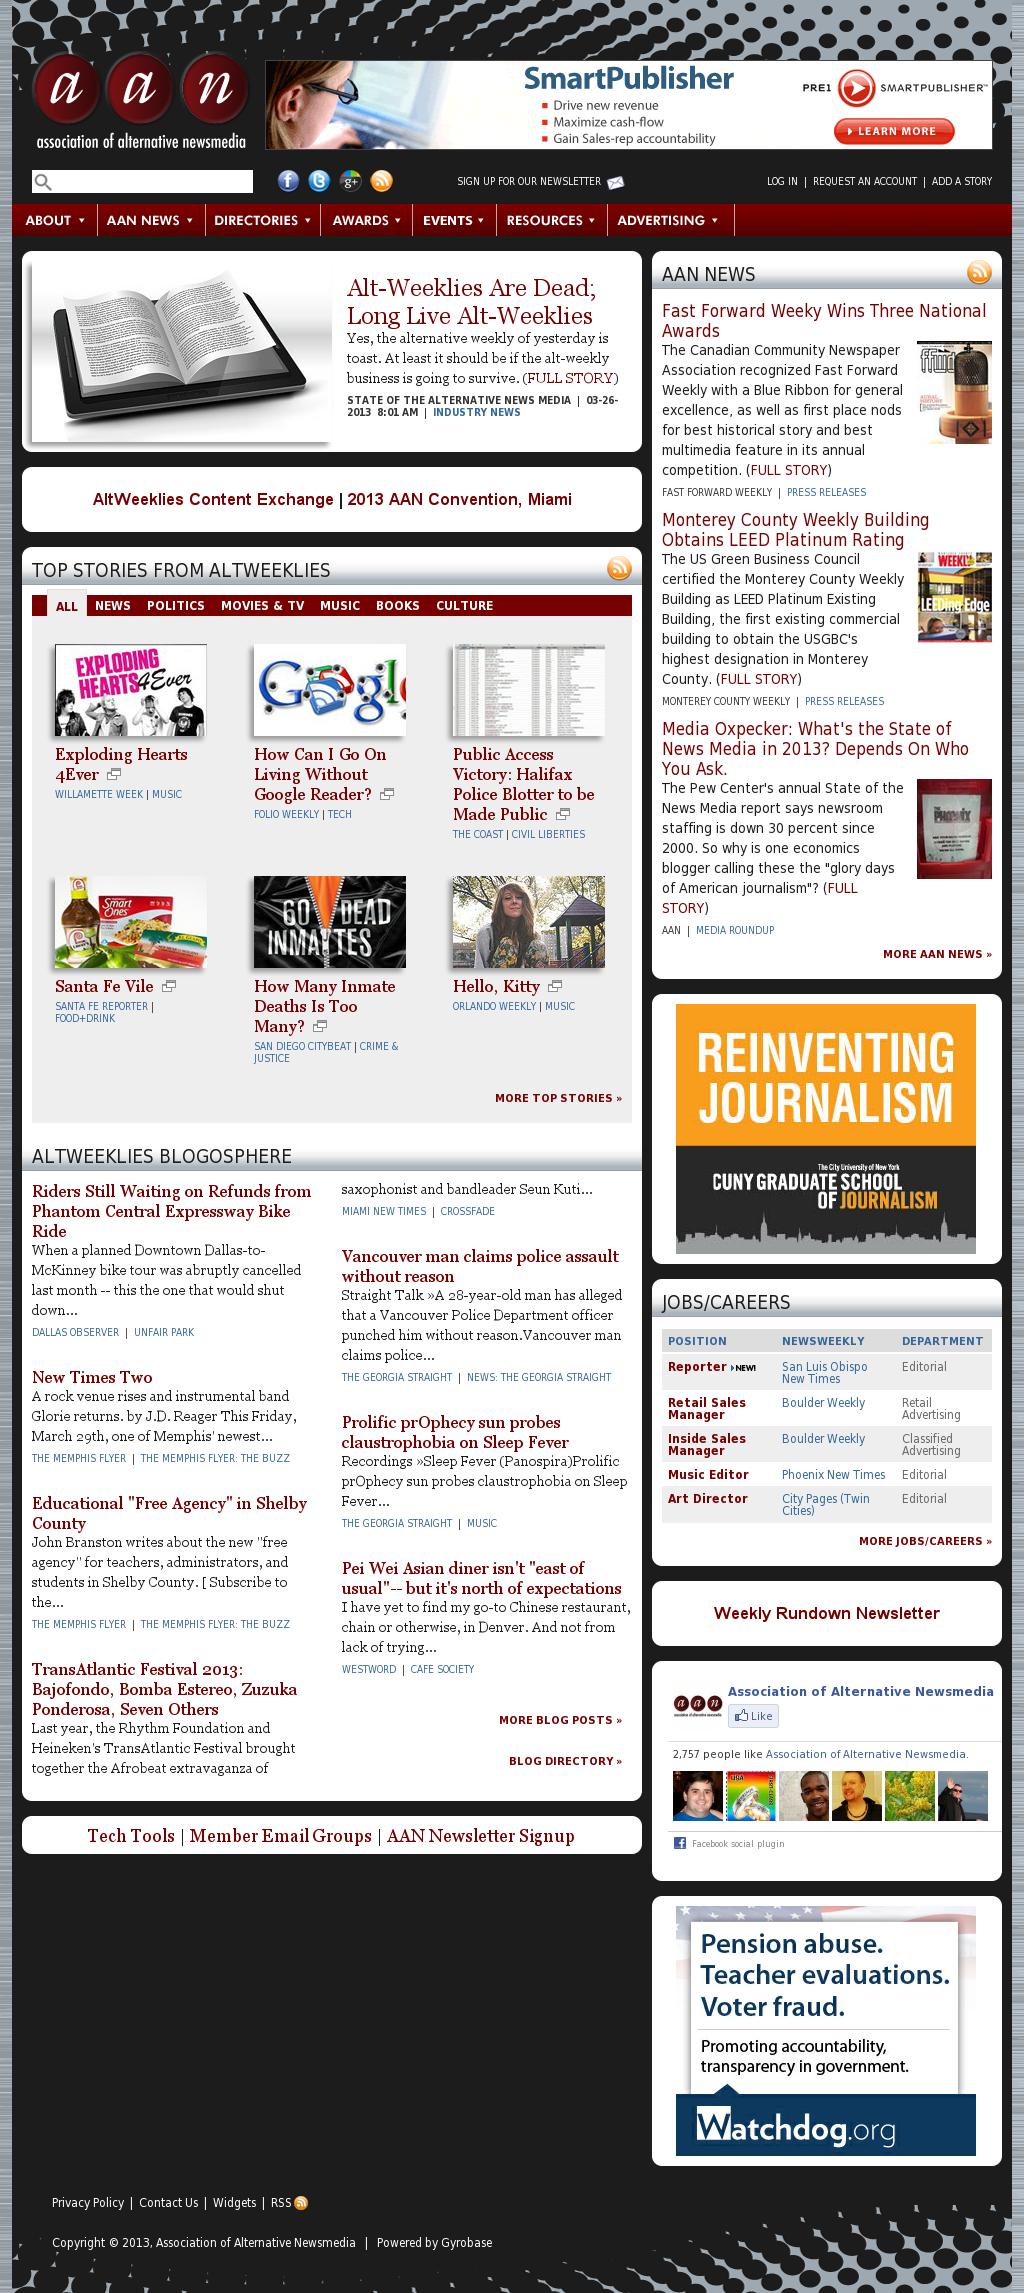 Association of Alternative Newsmedia at Thursday March 28, 2013, 5 p.m. UTC